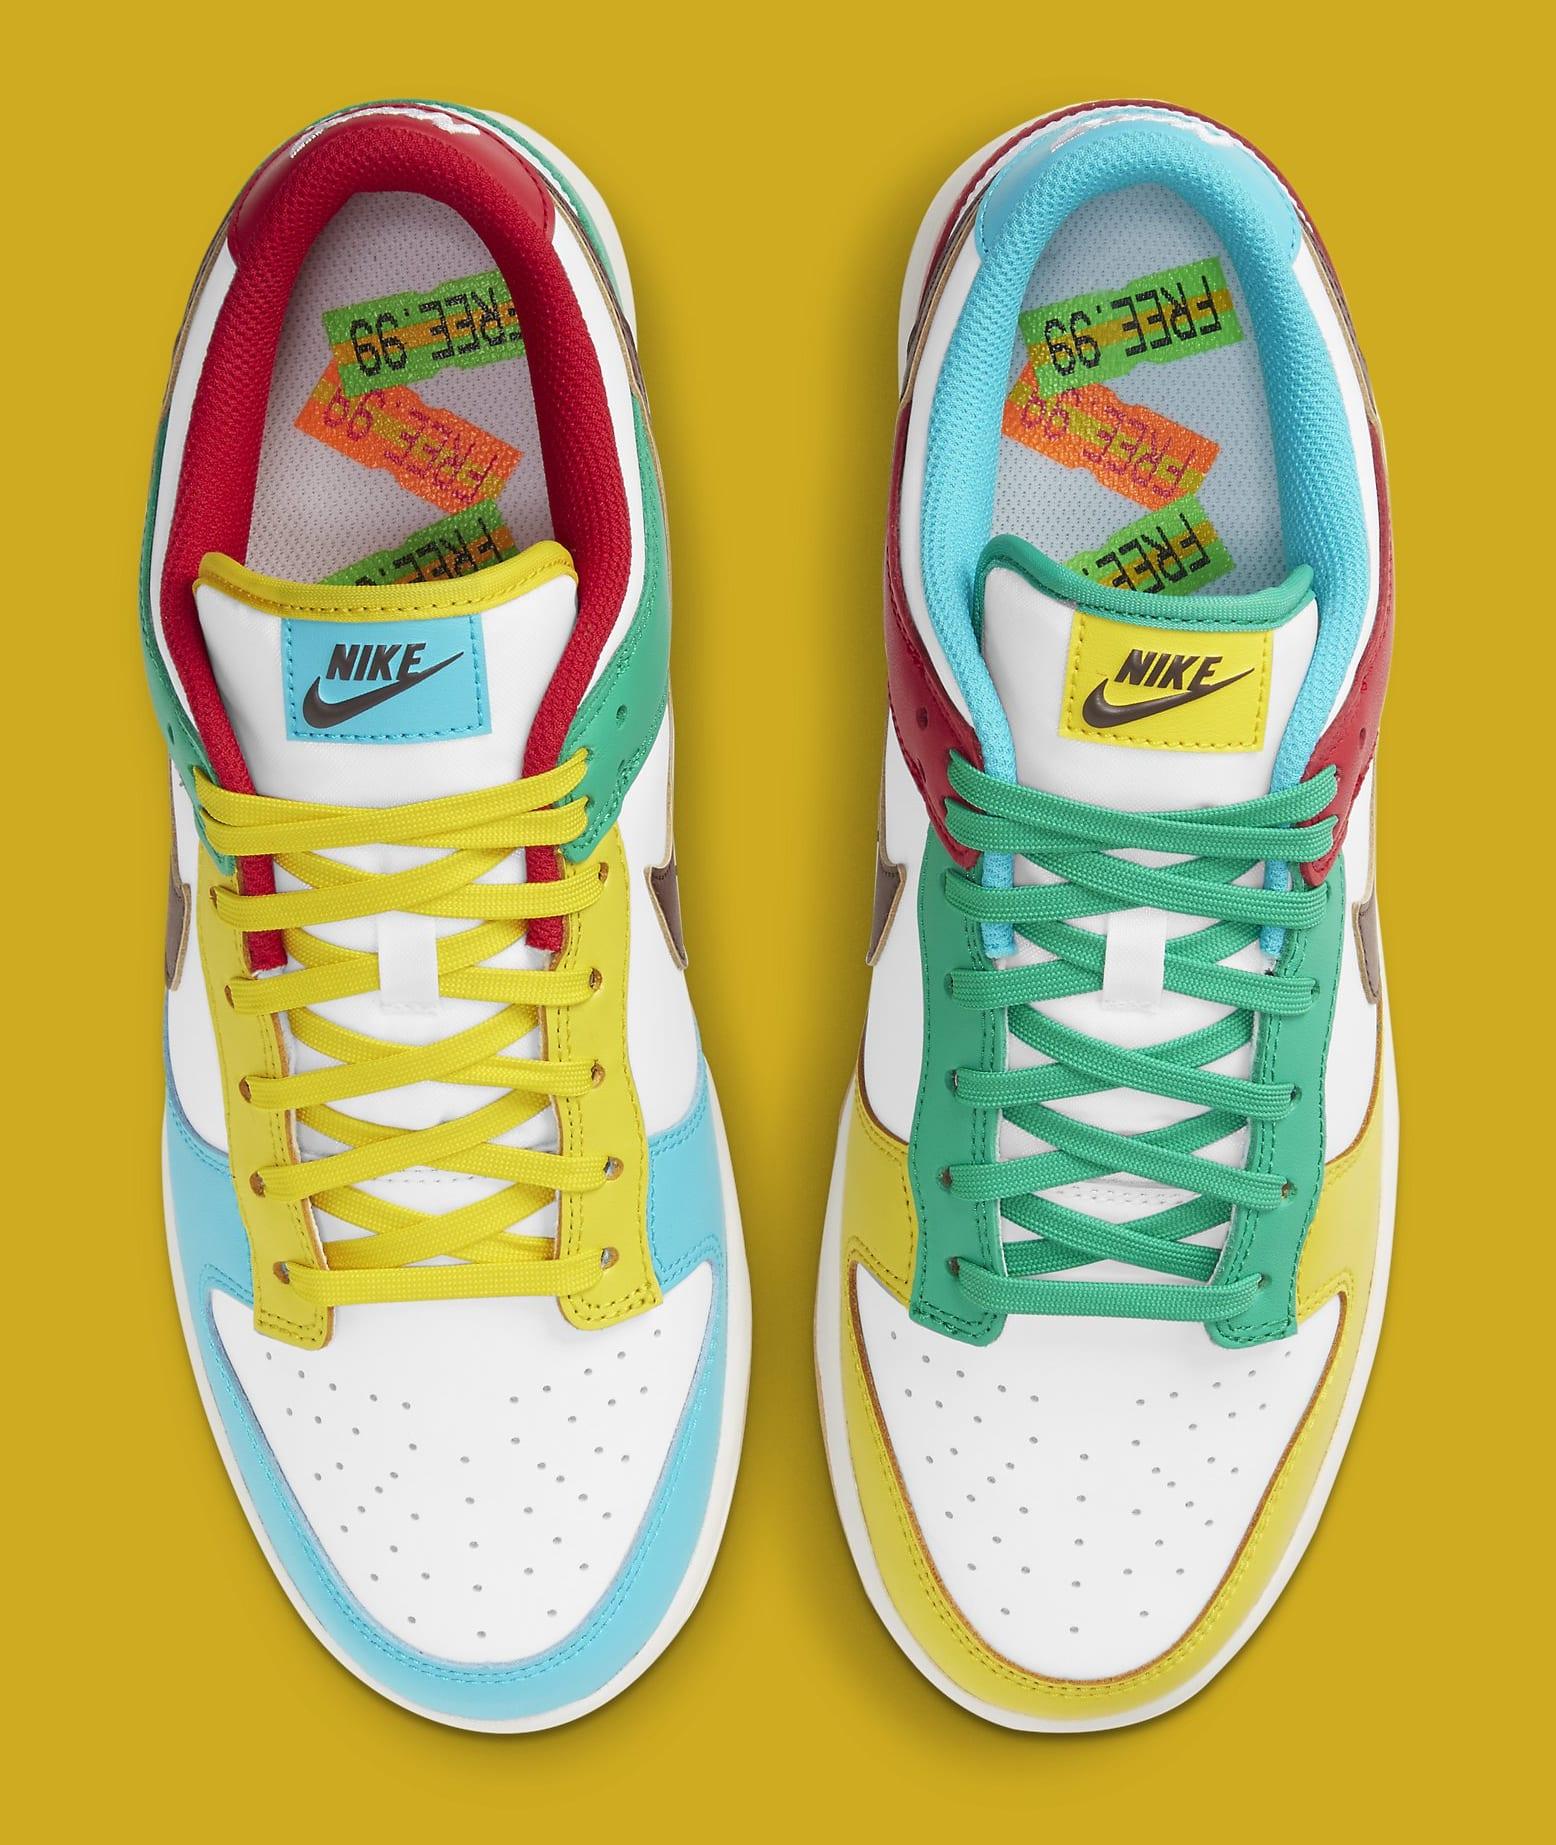 Nike Dunk Low 'Free.99 White' DH0952-100 Top